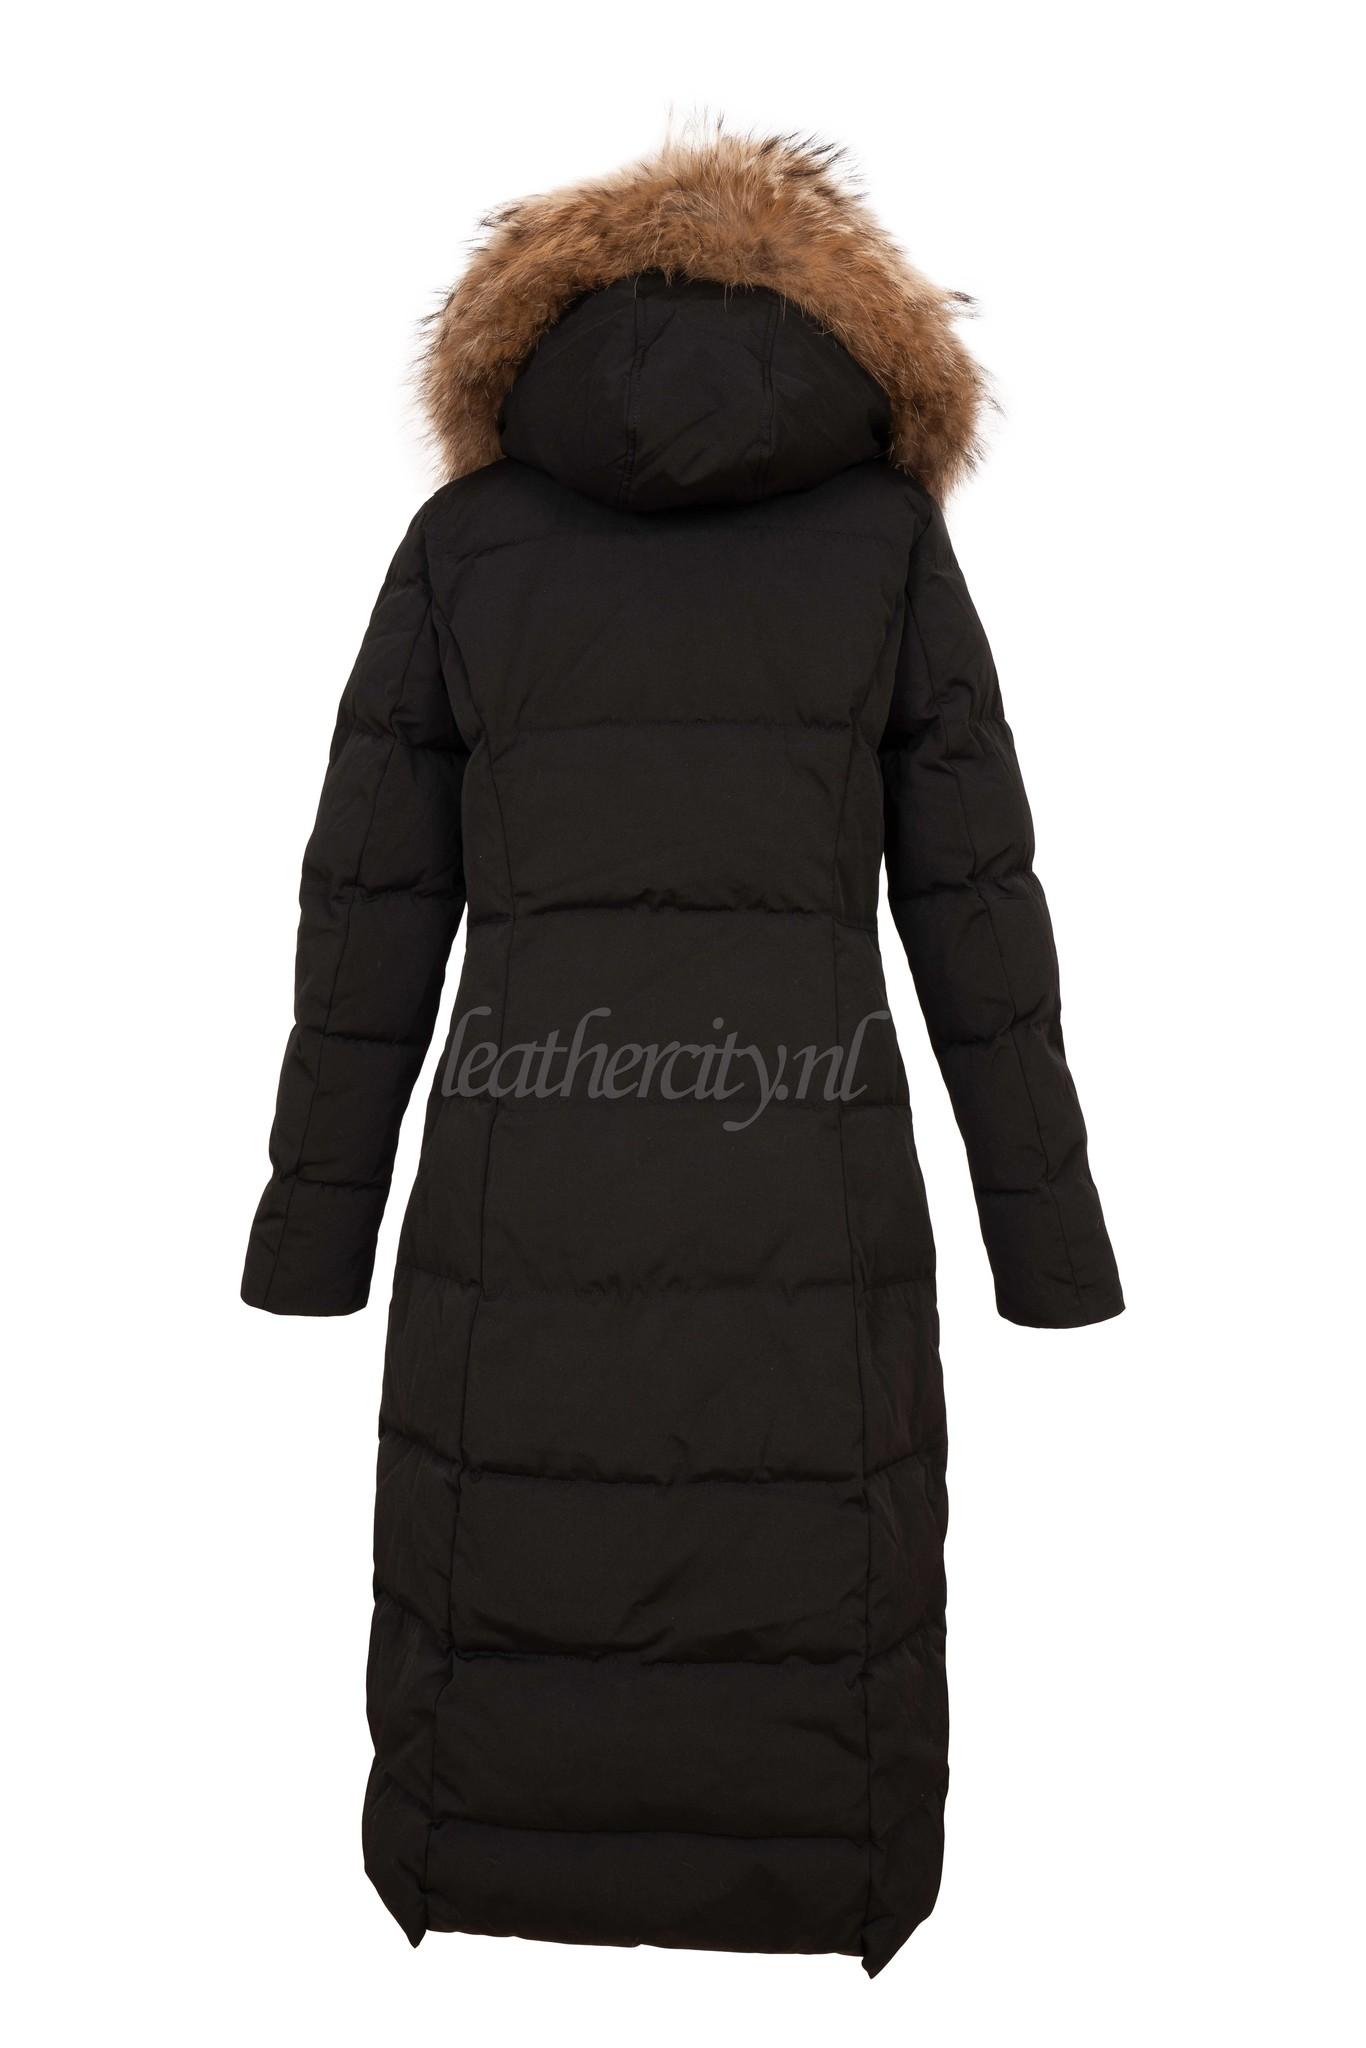 Attentif   Winterjas dames lang zwart parka